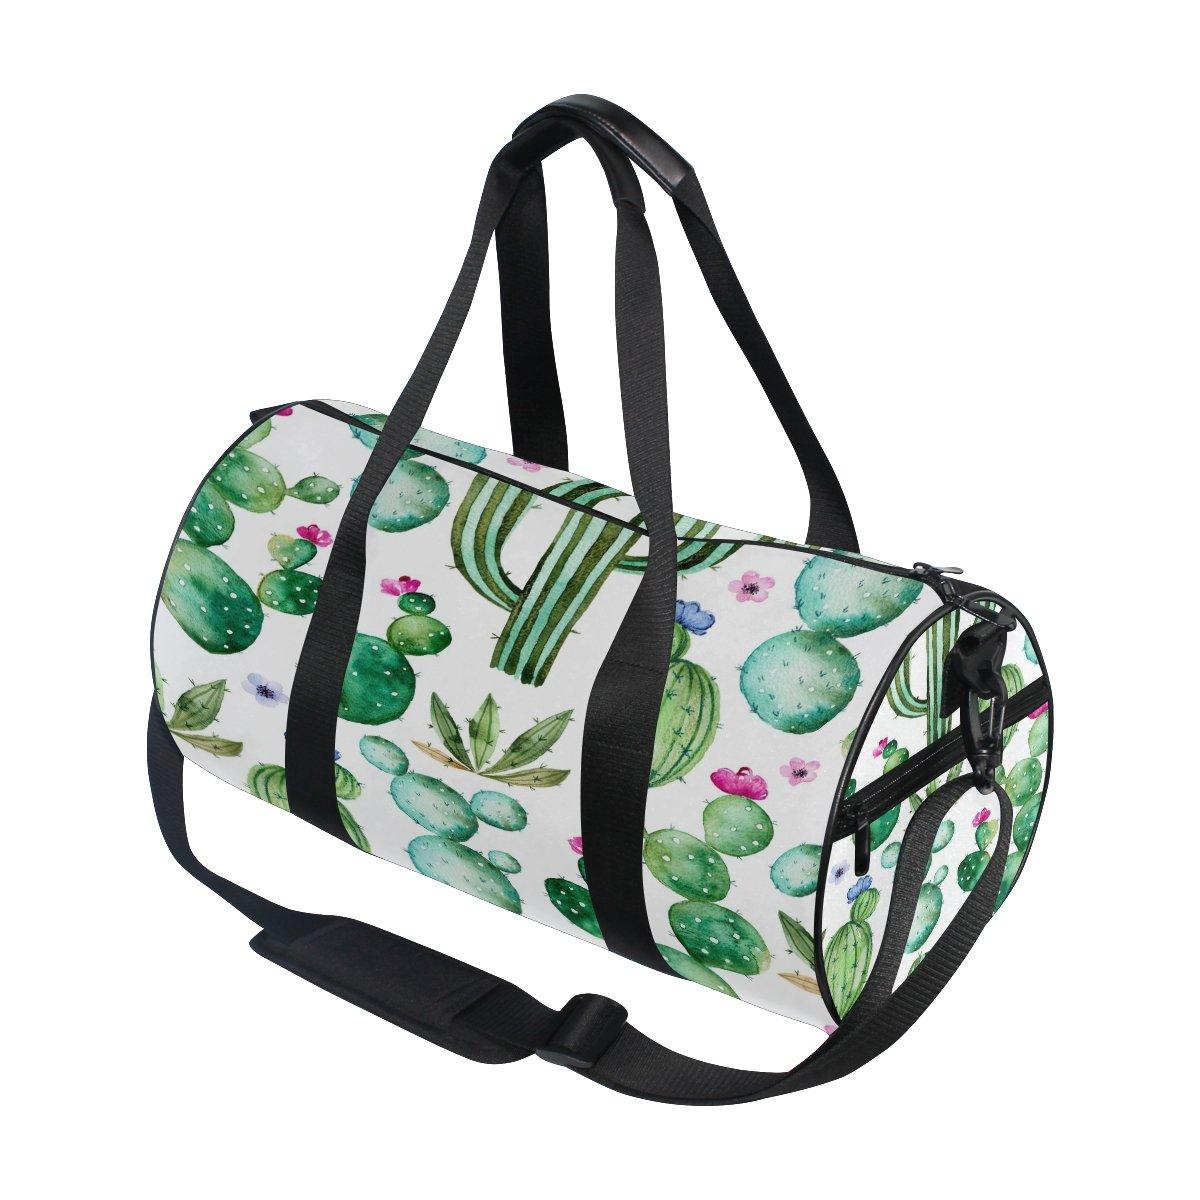 Use4 Summer Watercolor Cactus Travel Duffel Bag Sport Gym Luggage Bag for Men Women